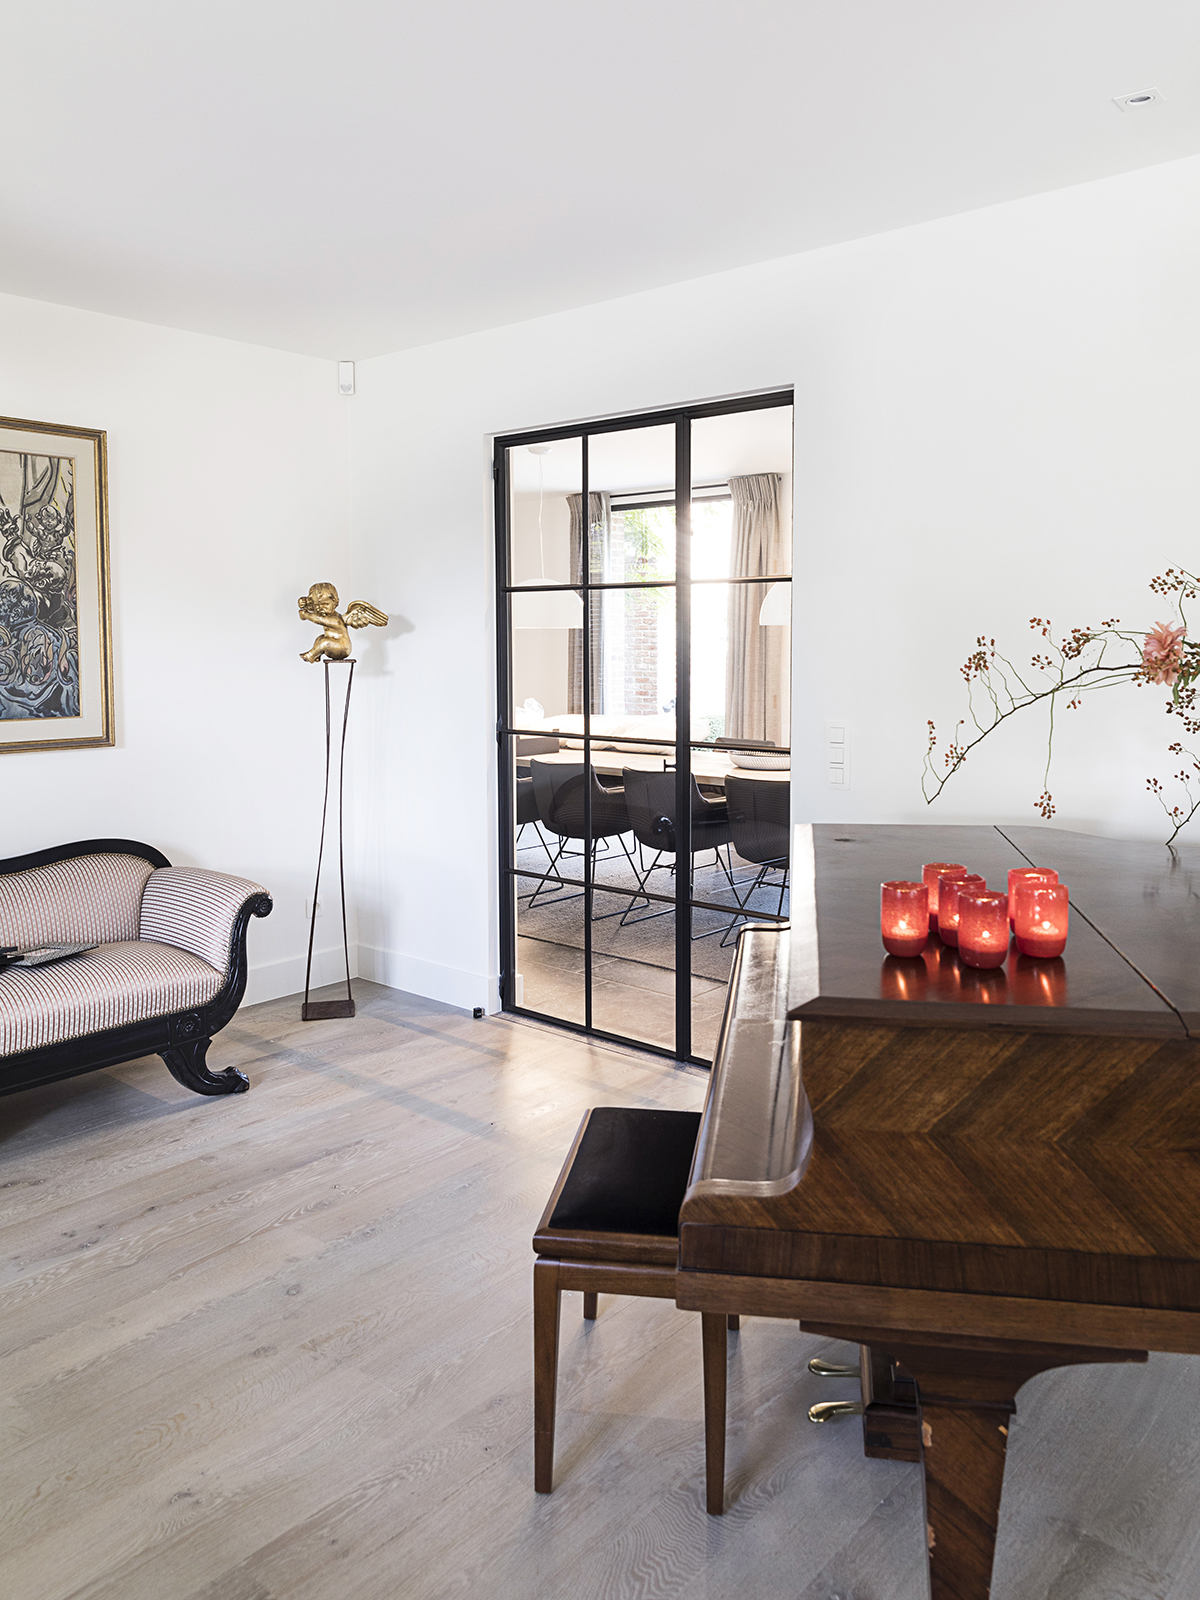 Dauby, deurbeslag, meubelbeslag, Interieurarchitect Paul Rijs, interieurproject